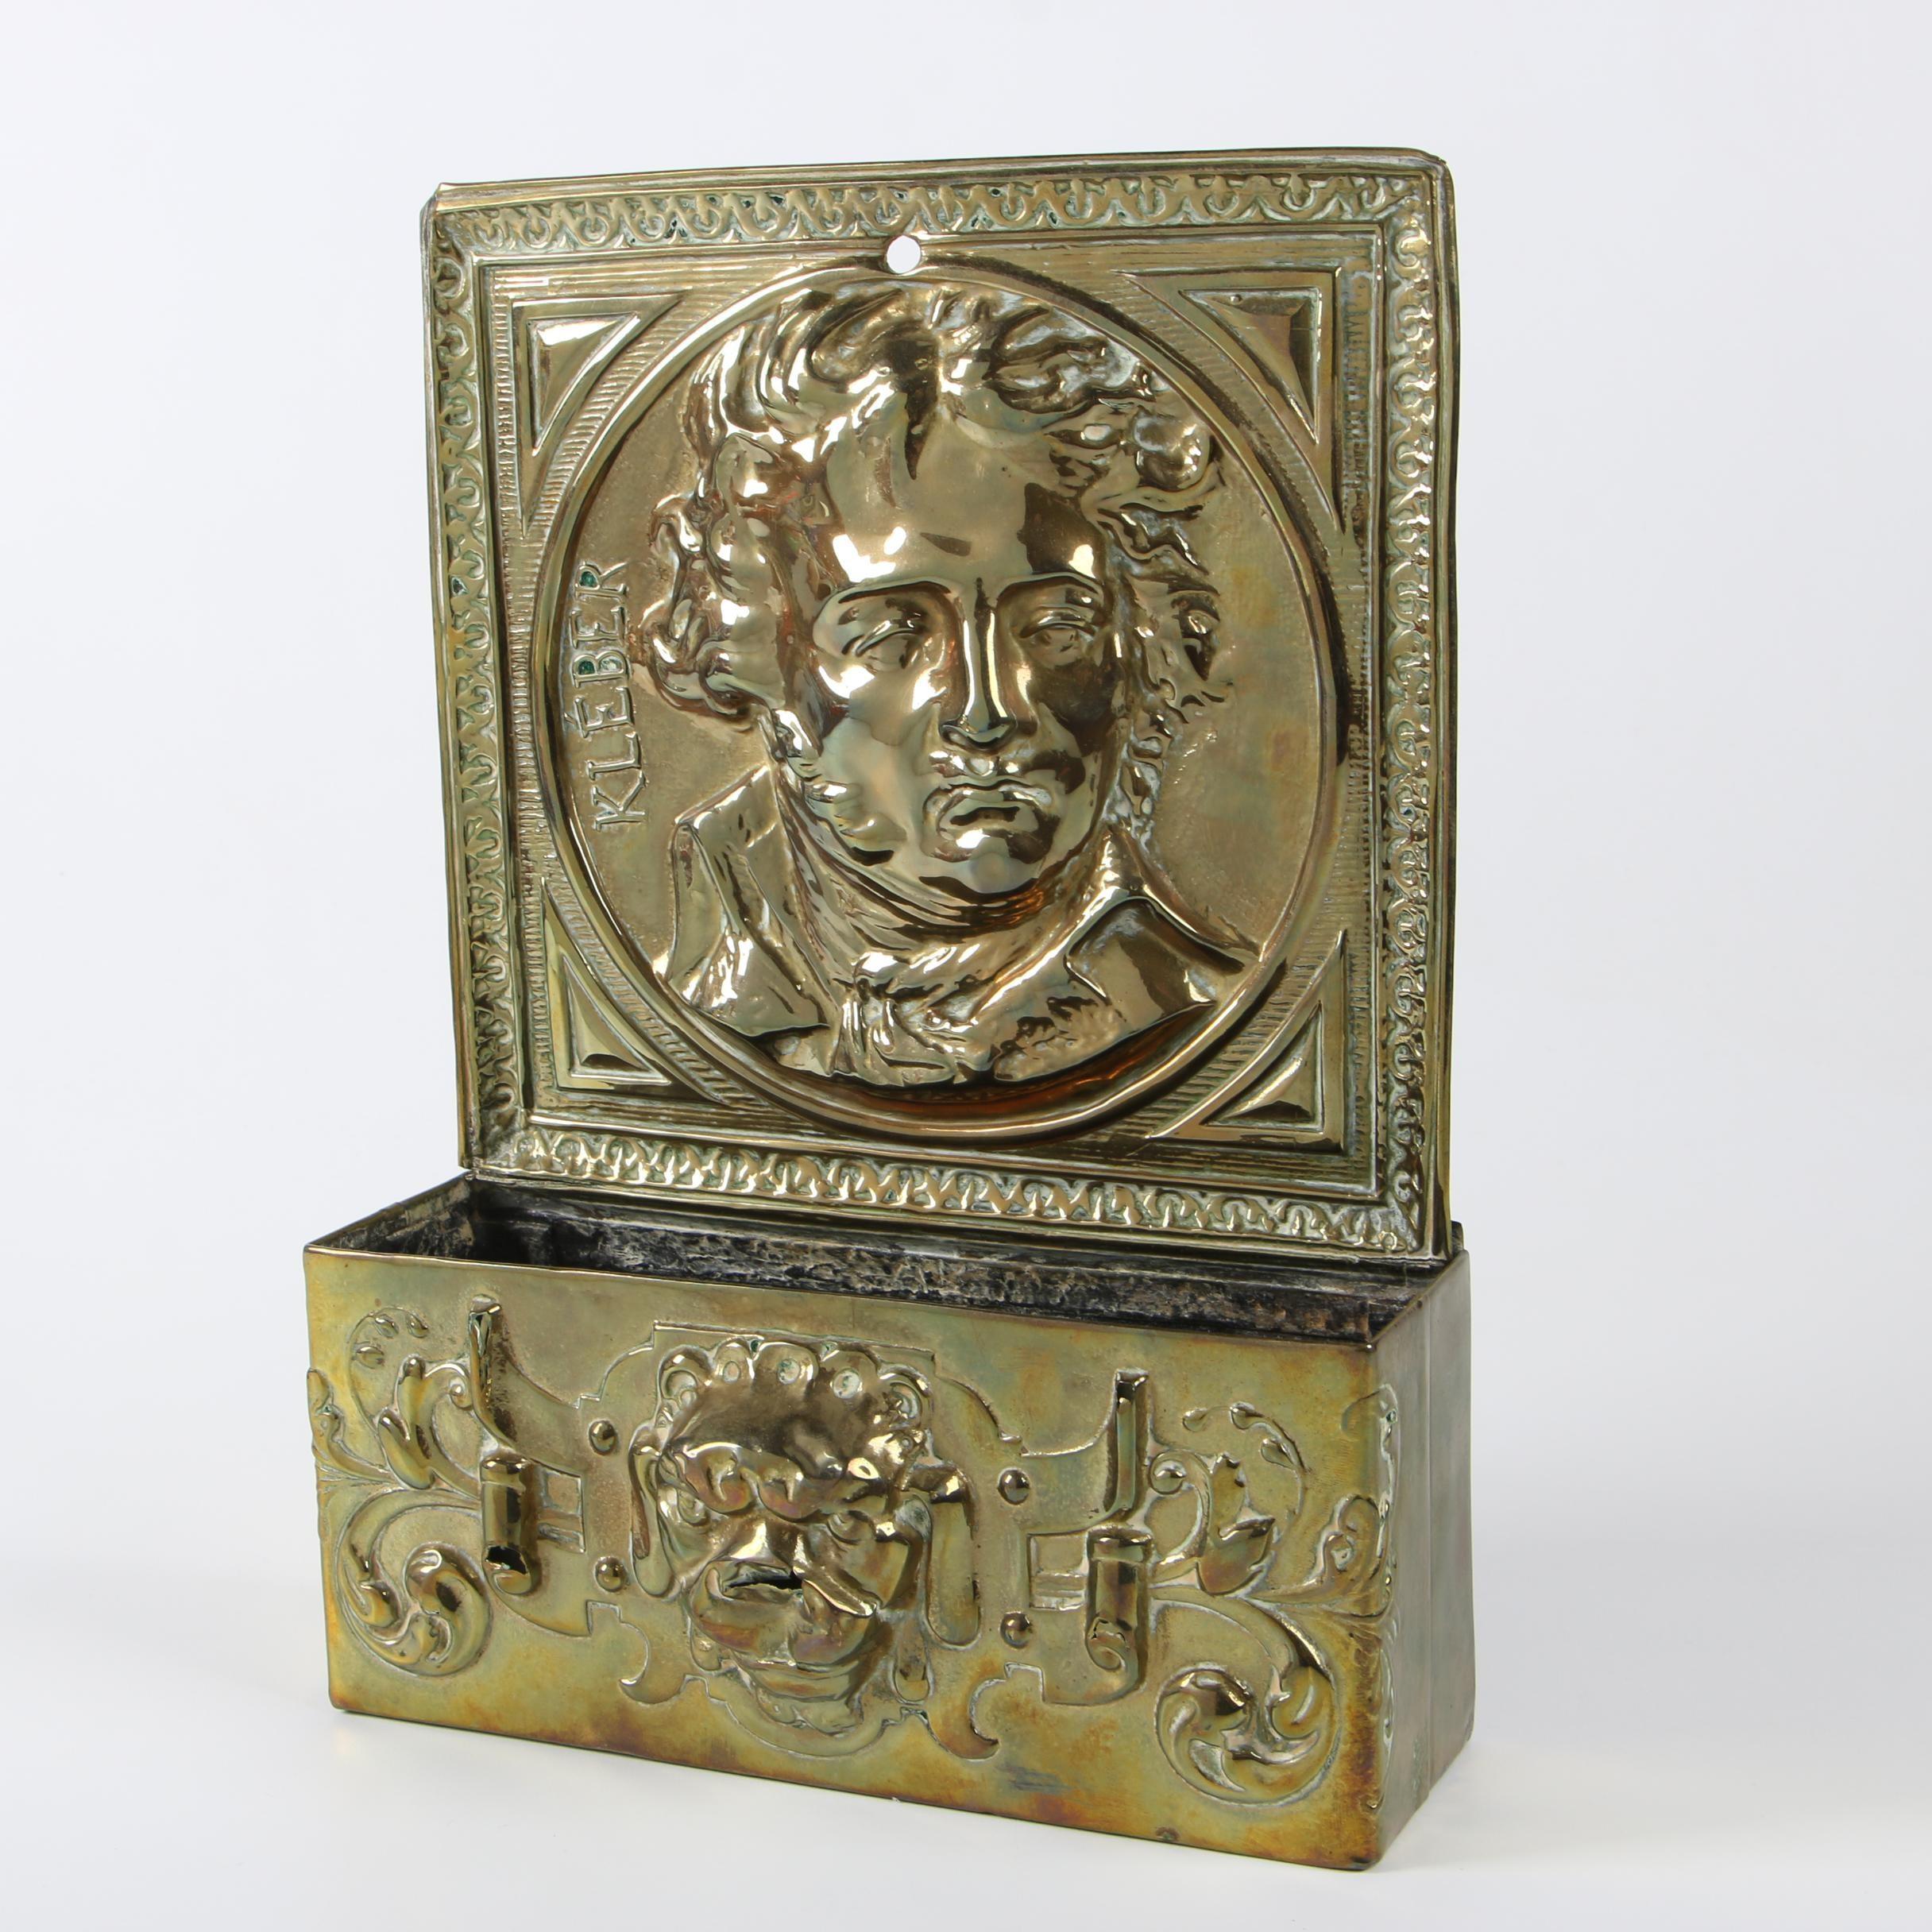 Embossed Brass Letter Holder with Portrait of Jean-Baptiste Kléber